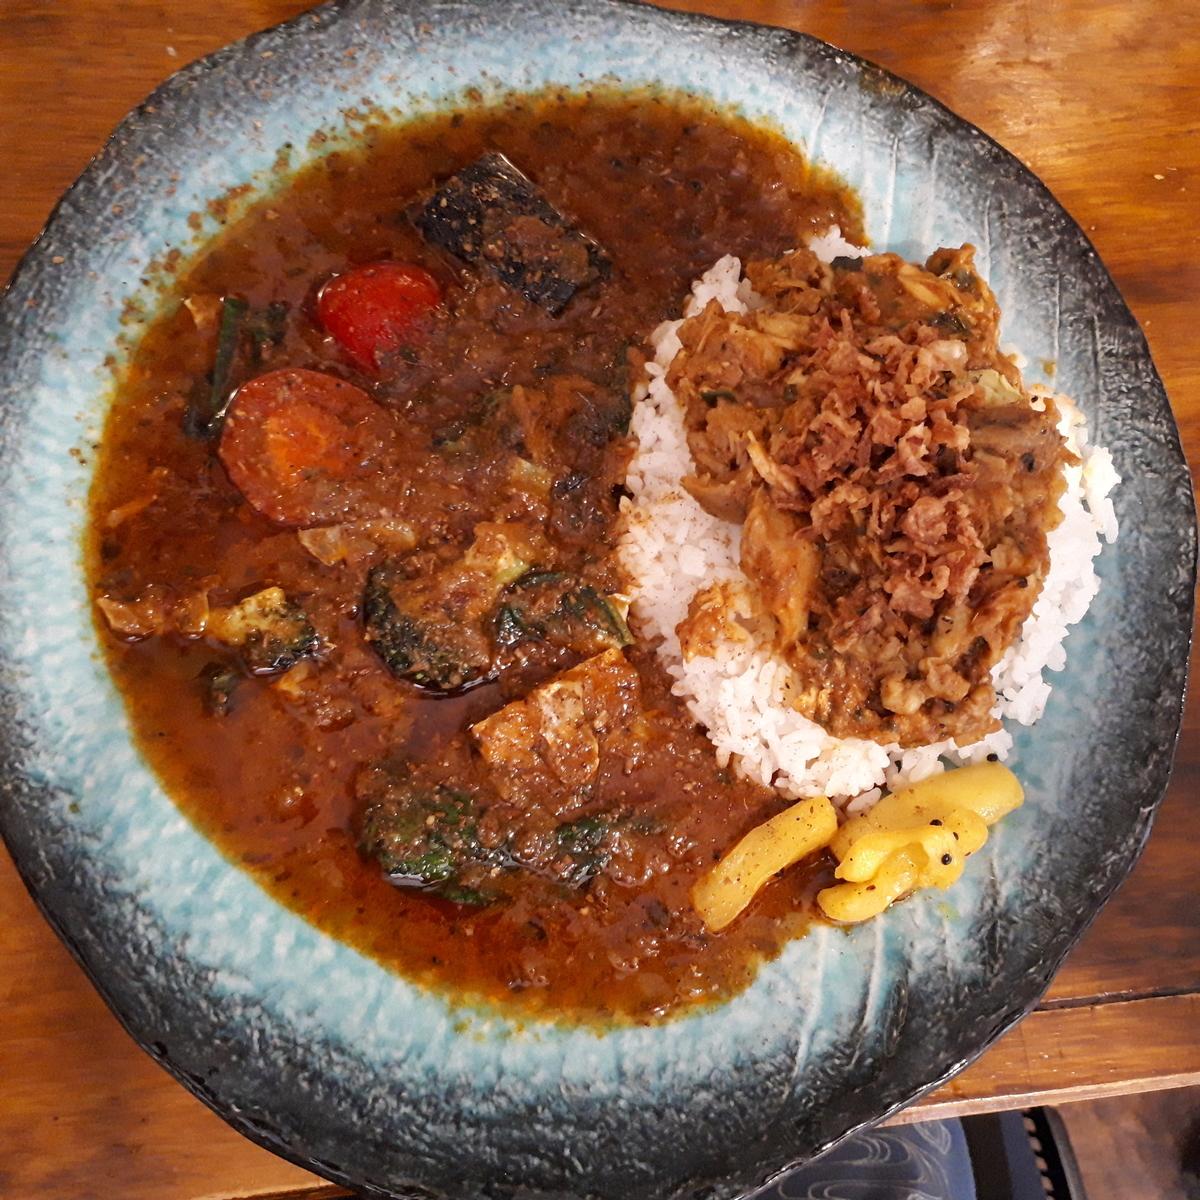 wacca 2019年8月3日 鶏と鰹の出汁カレーとパキスタン式無水チキンのダブルチキンカレー